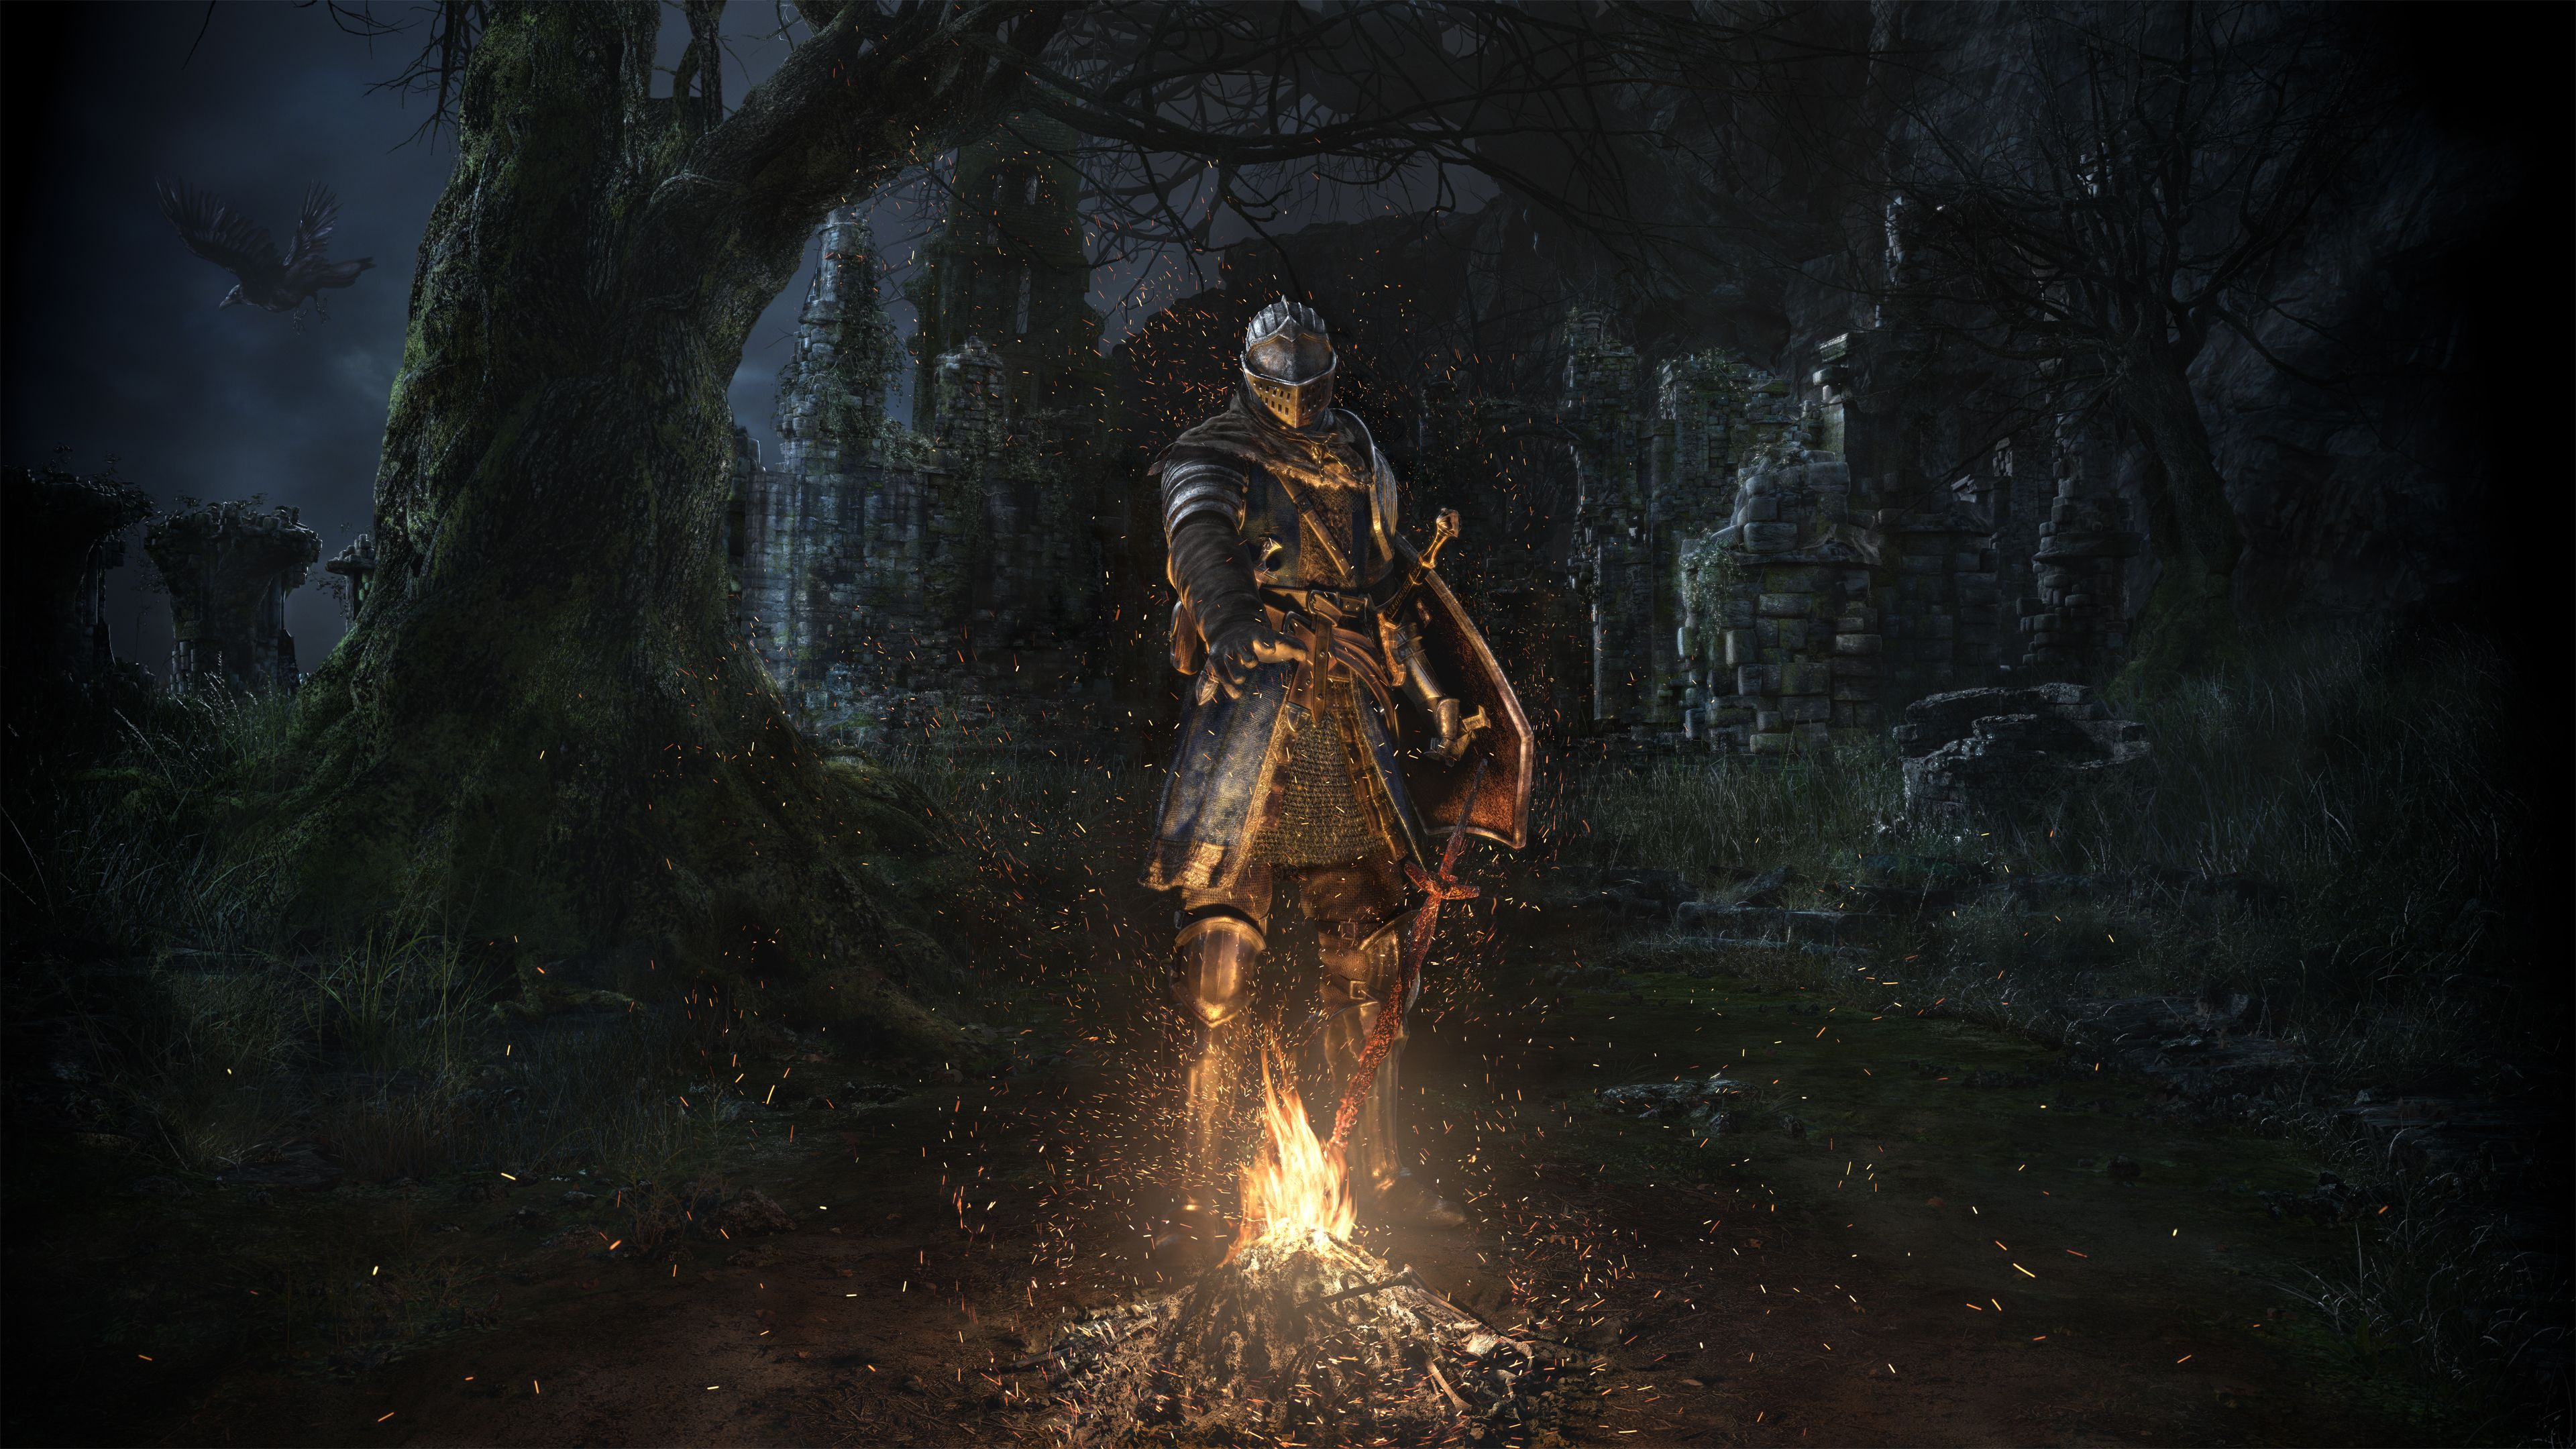 Dark Souls Wallpapers Top Free Dark Souls Backgrounds Wallpaperaccess